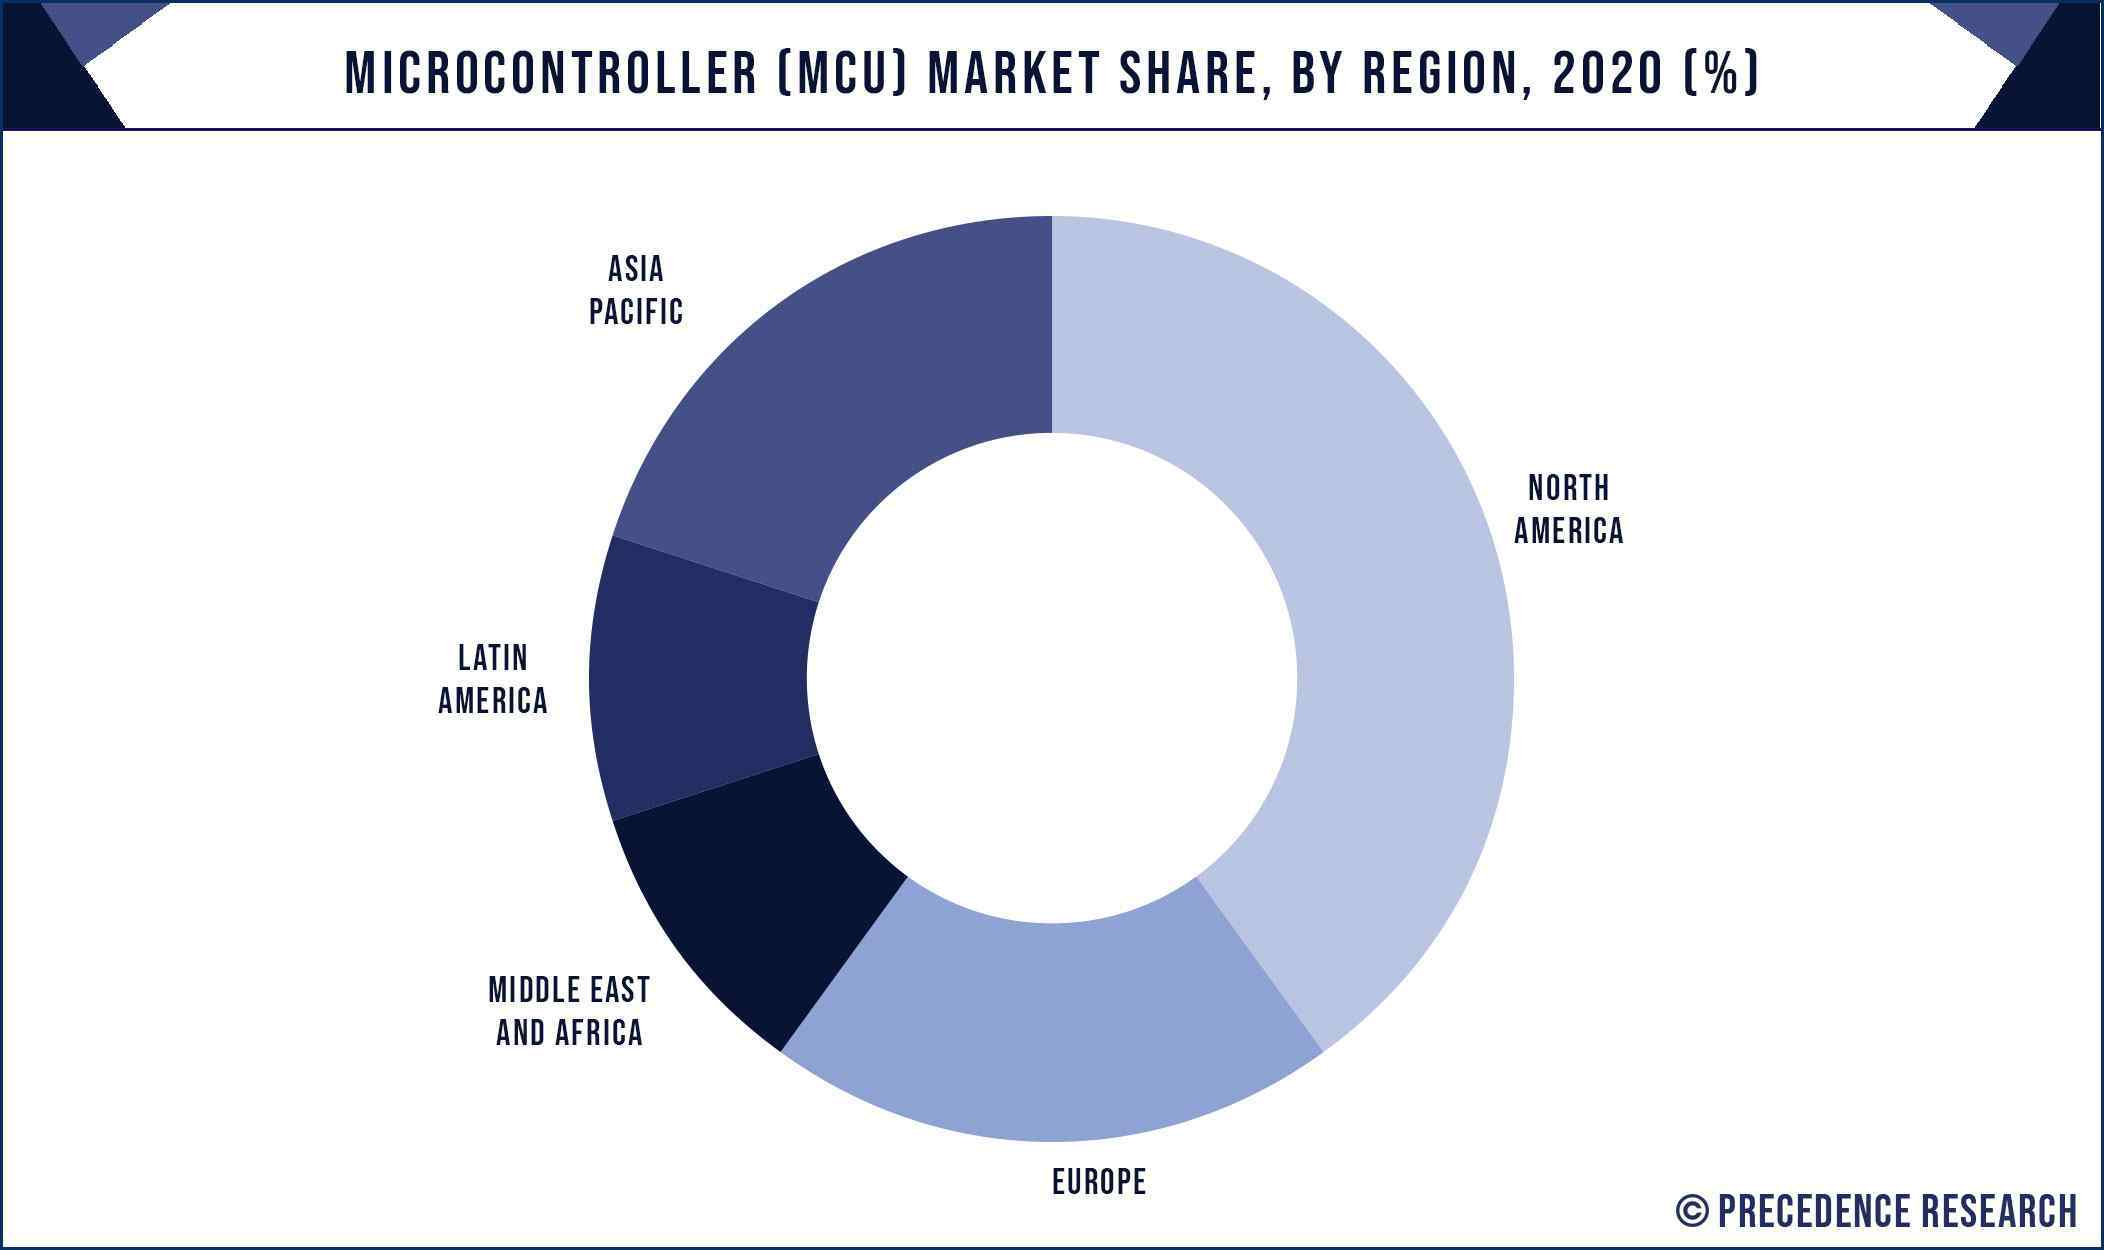 Microcontroller (MCU) Market Share, By Region, 2020 (%)